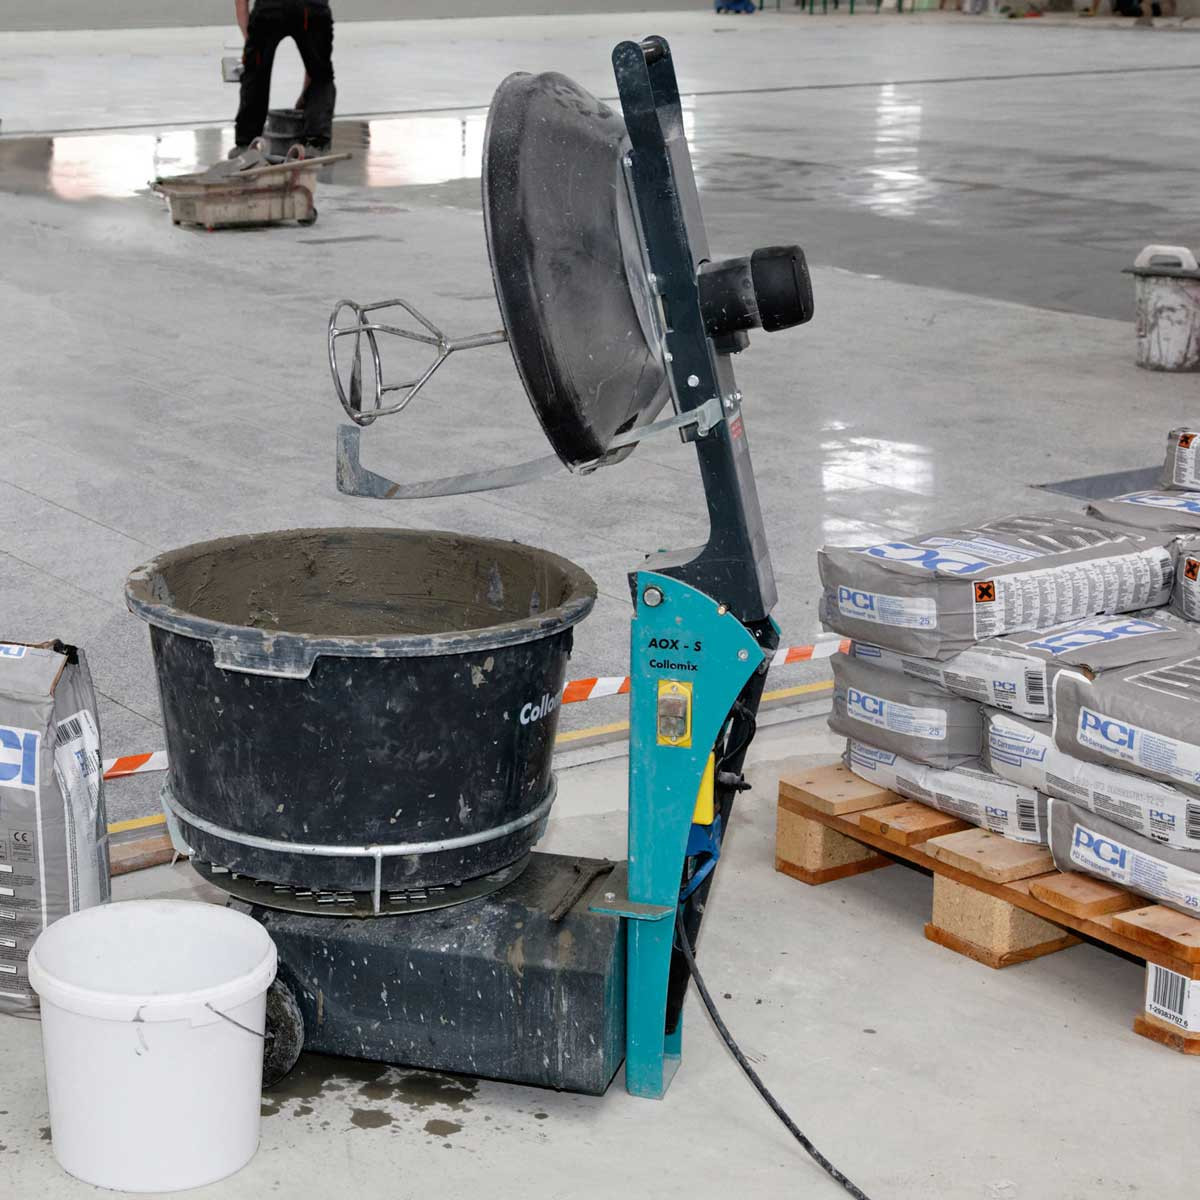 Collomix AOX-S bucket mixer open